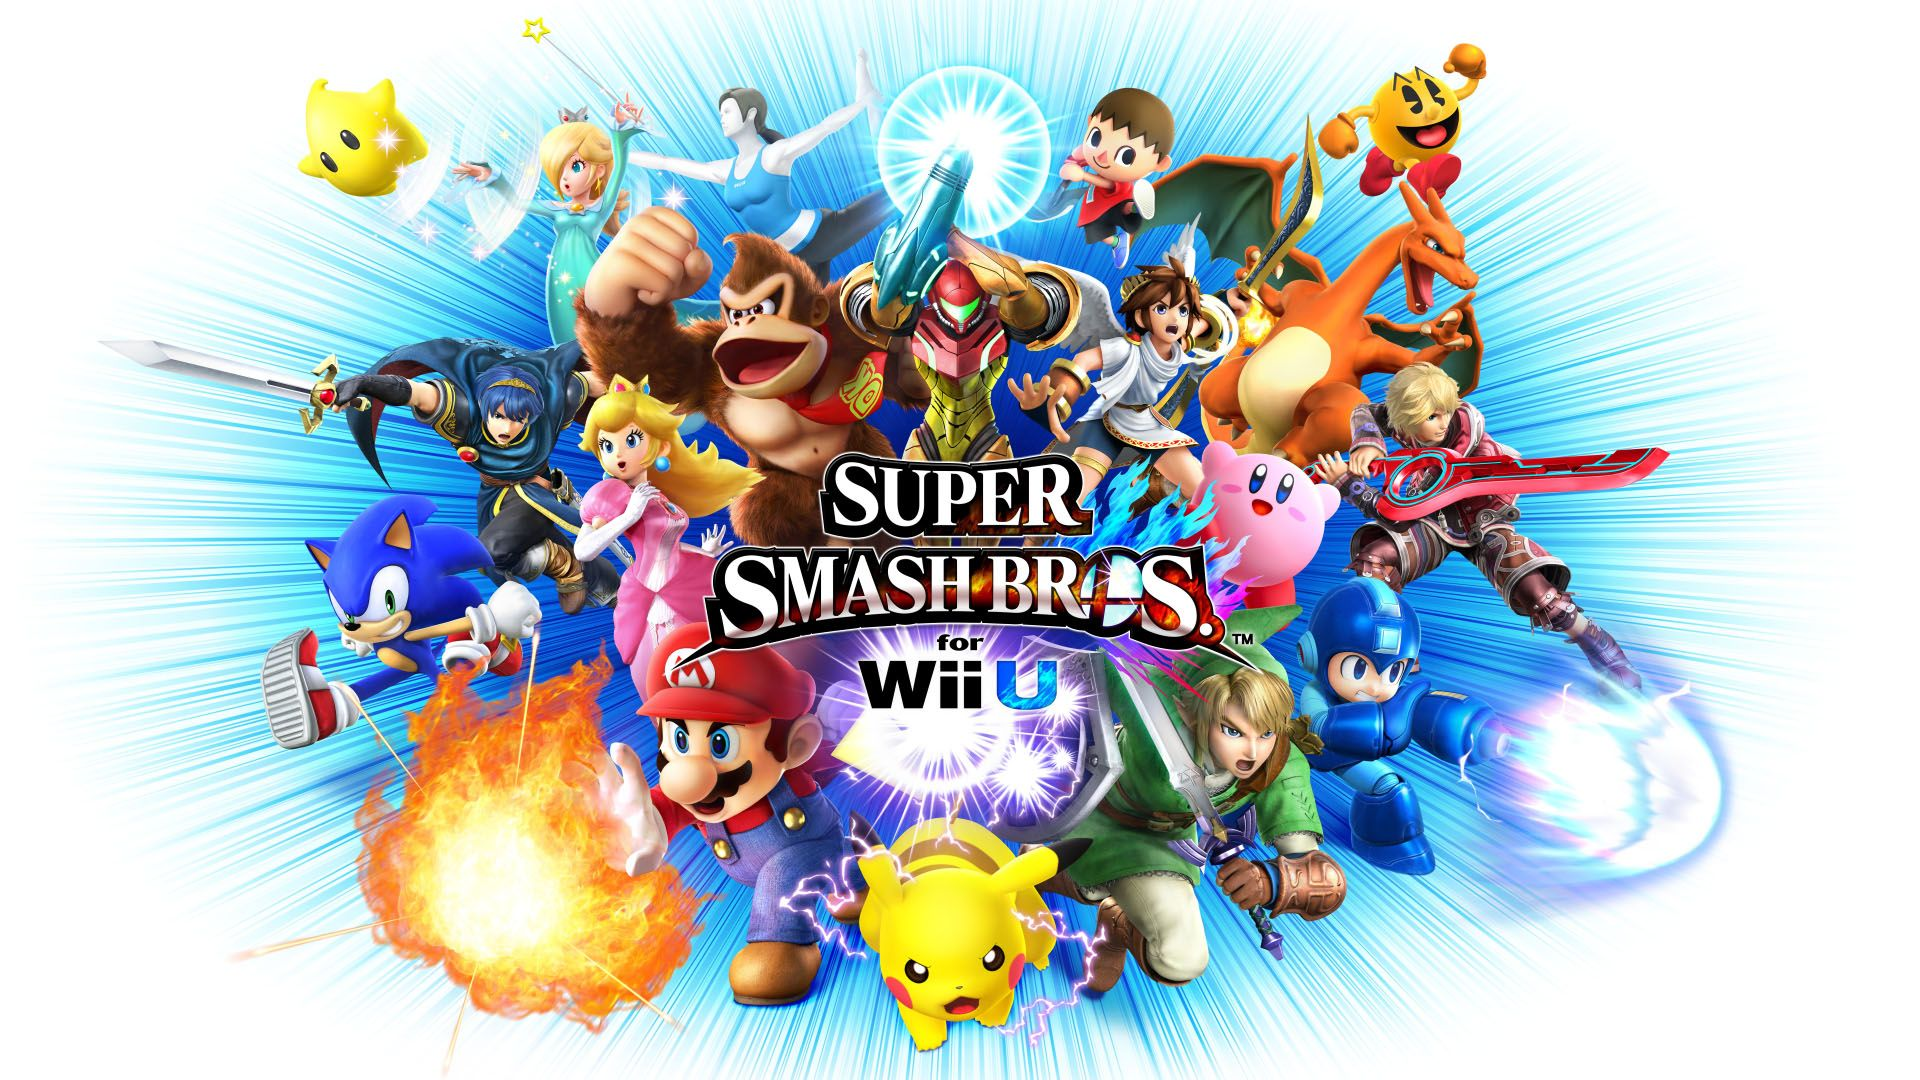 Super Smash Bros Wii U Wallpaper Super Smash Bros Smash Bros Wii U